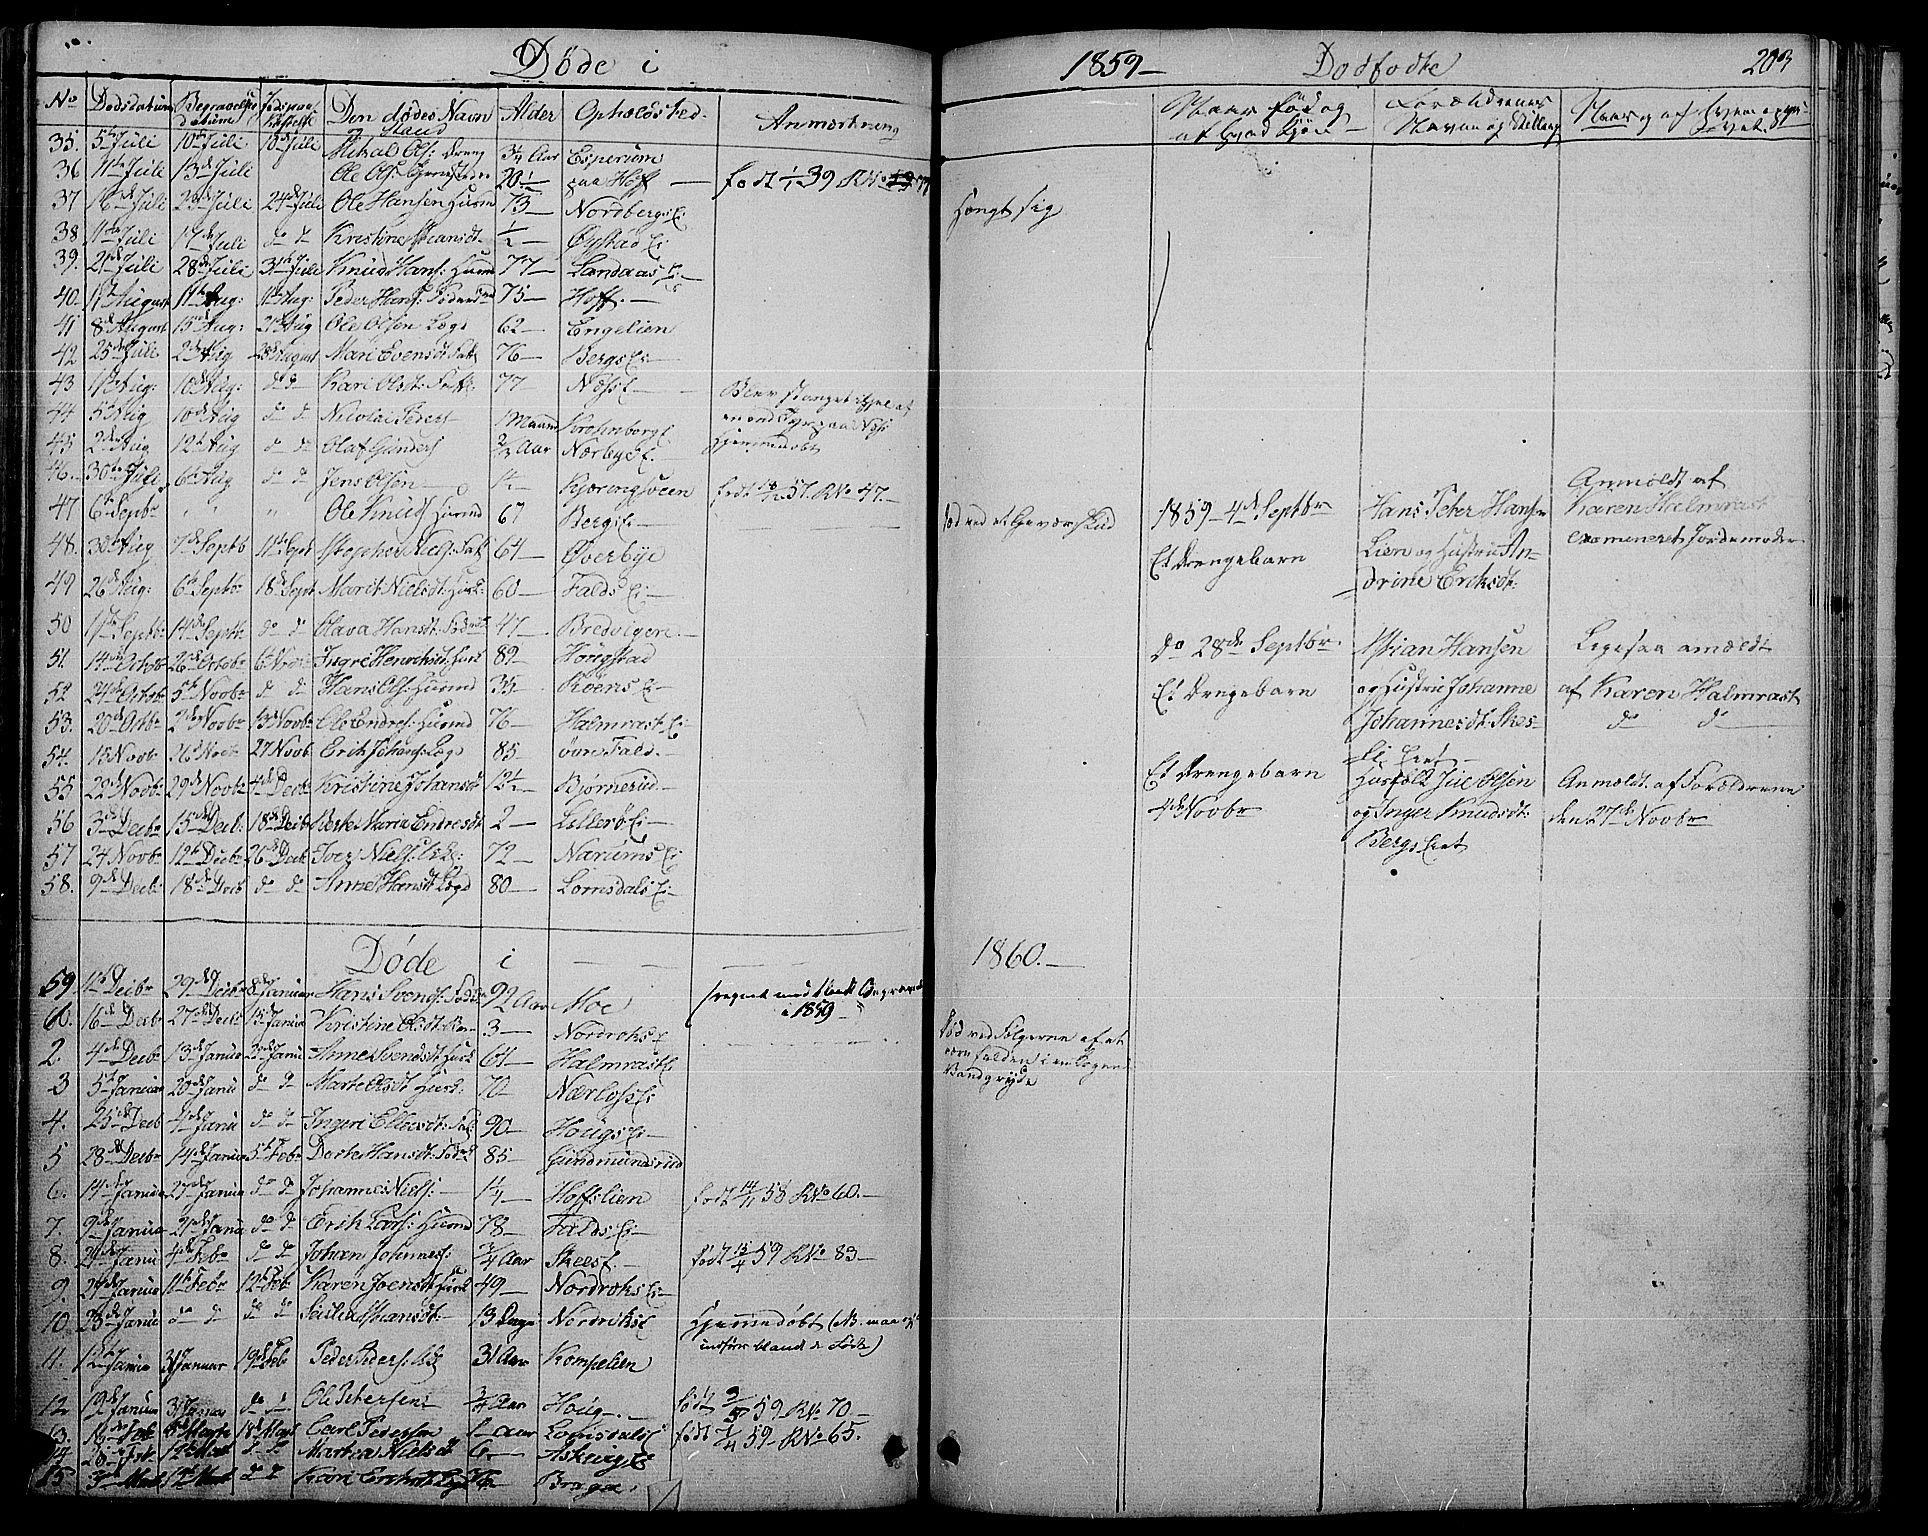 SAH, Søndre Land prestekontor, L/L0001: Klokkerbok nr. 1, 1849-1883, s. 203